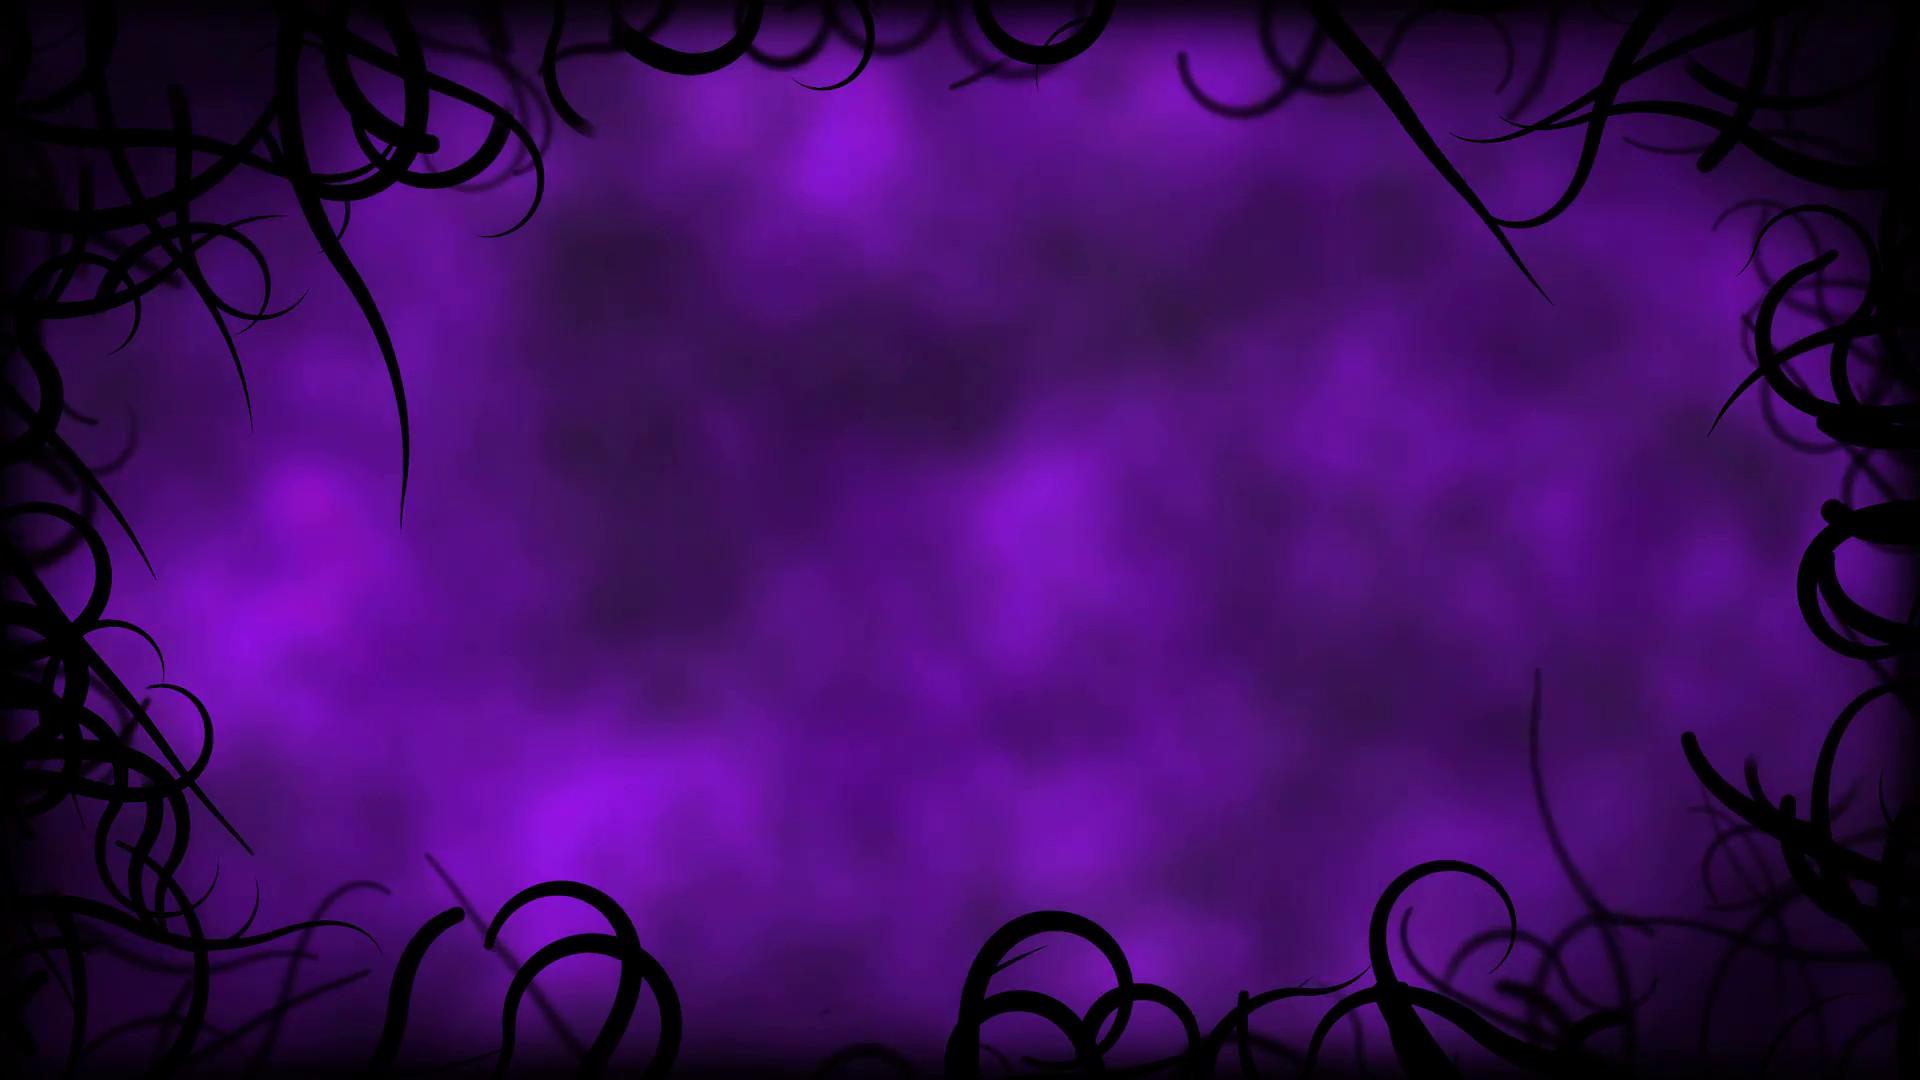 Black Vines Border Background Animation – Loop Purple Motion Background –  VideoBlocks